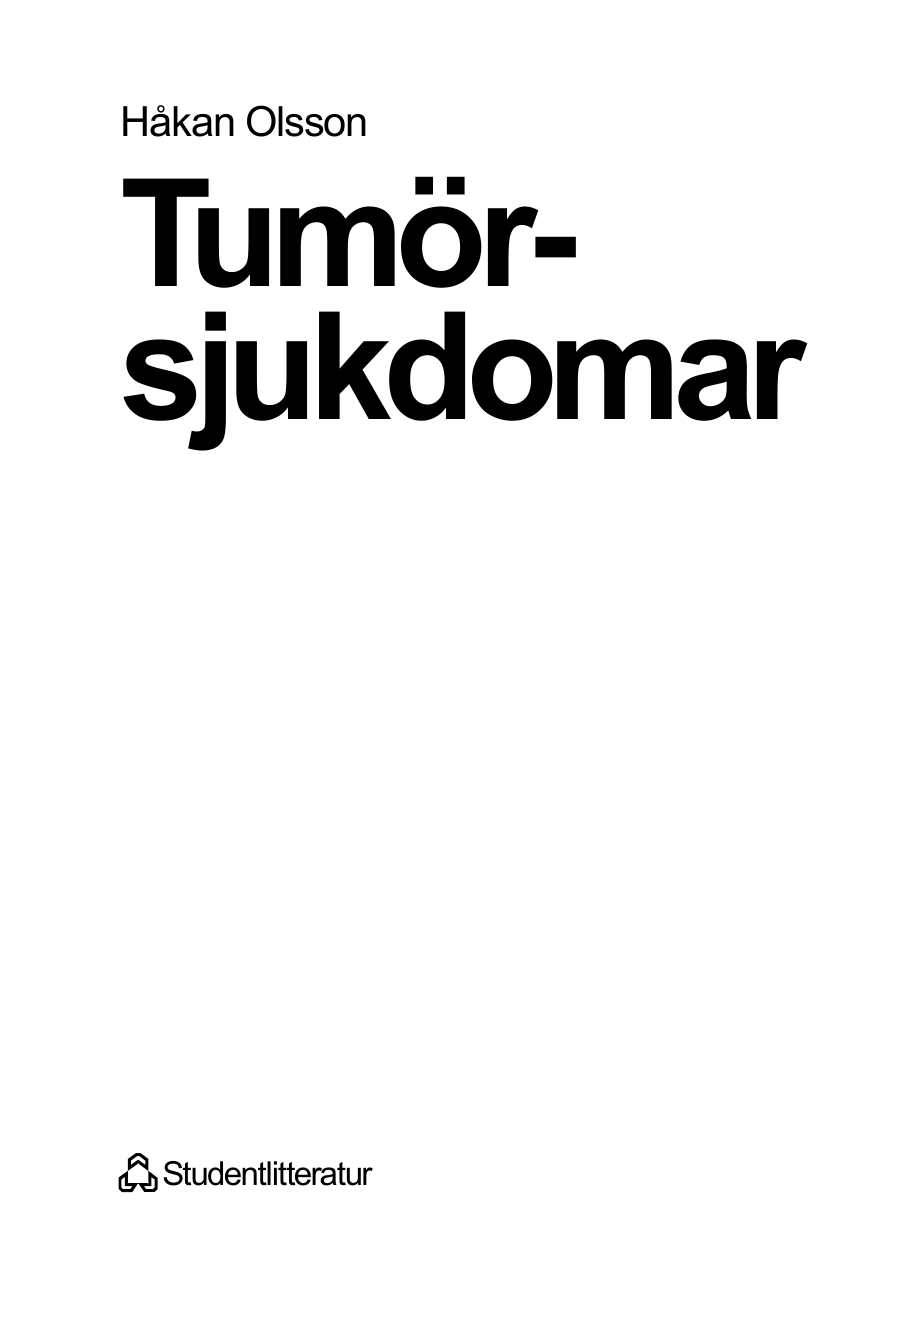 Gentest okar chans for cancerbehandling